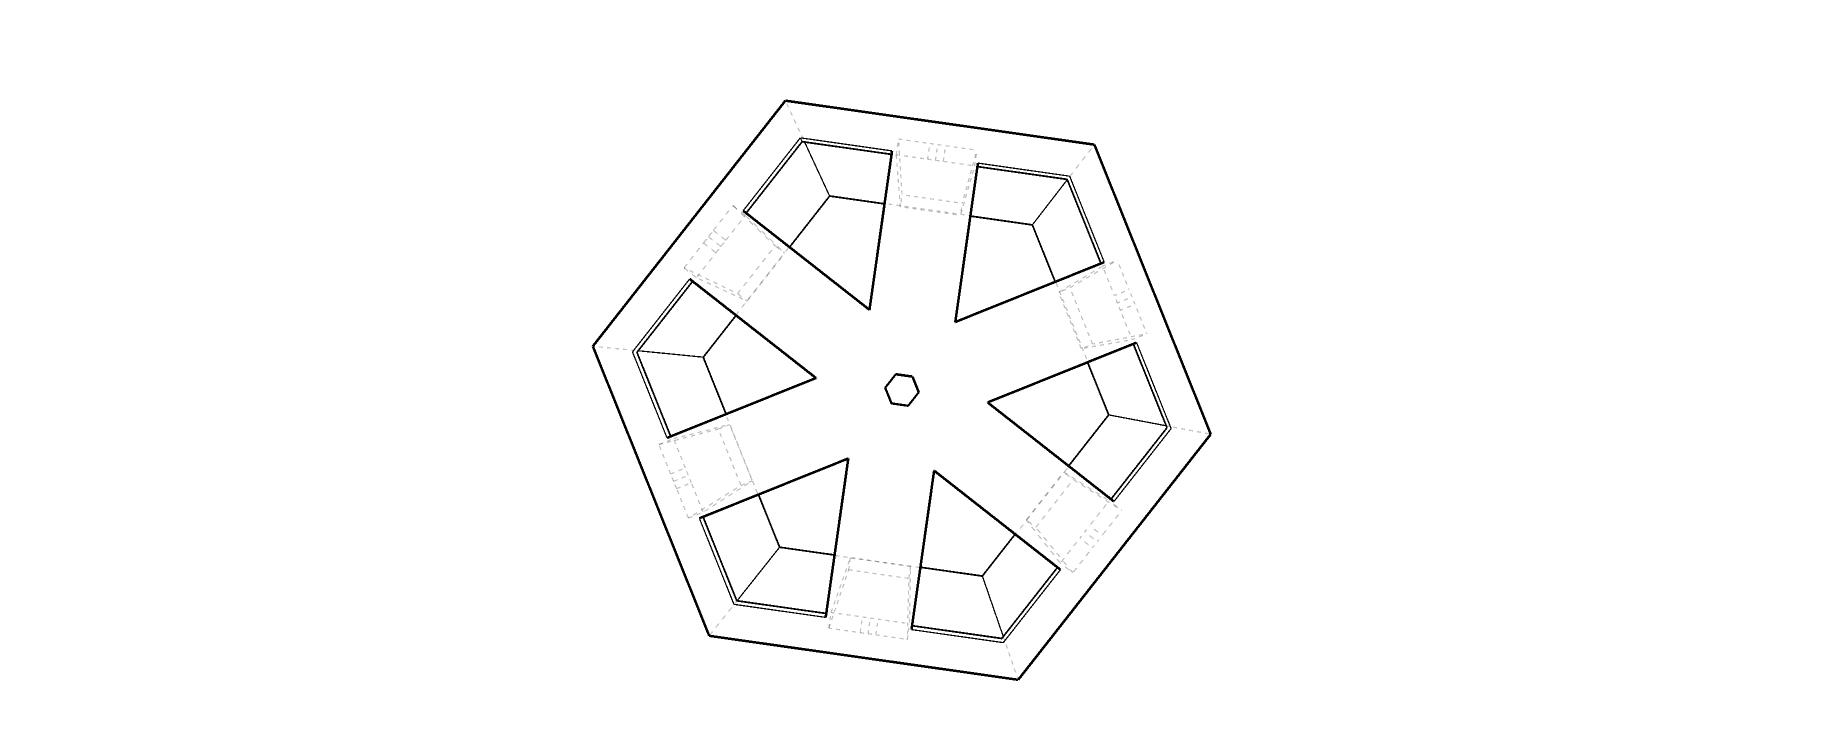 3 - Hexagon Seating Element B.jpg